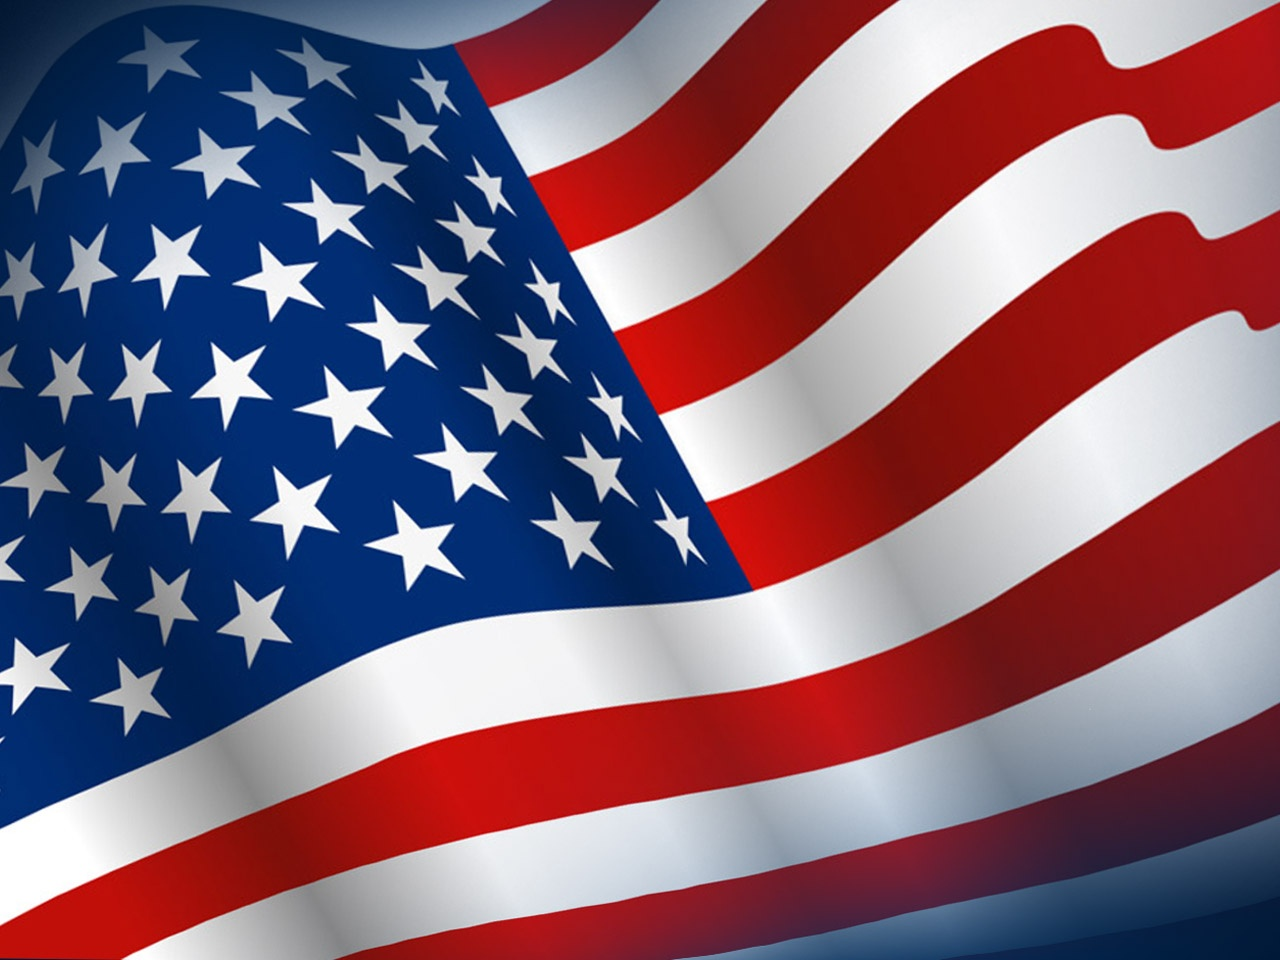 American Flag 2 Big TV Bkg_1537637271379.png.jpg